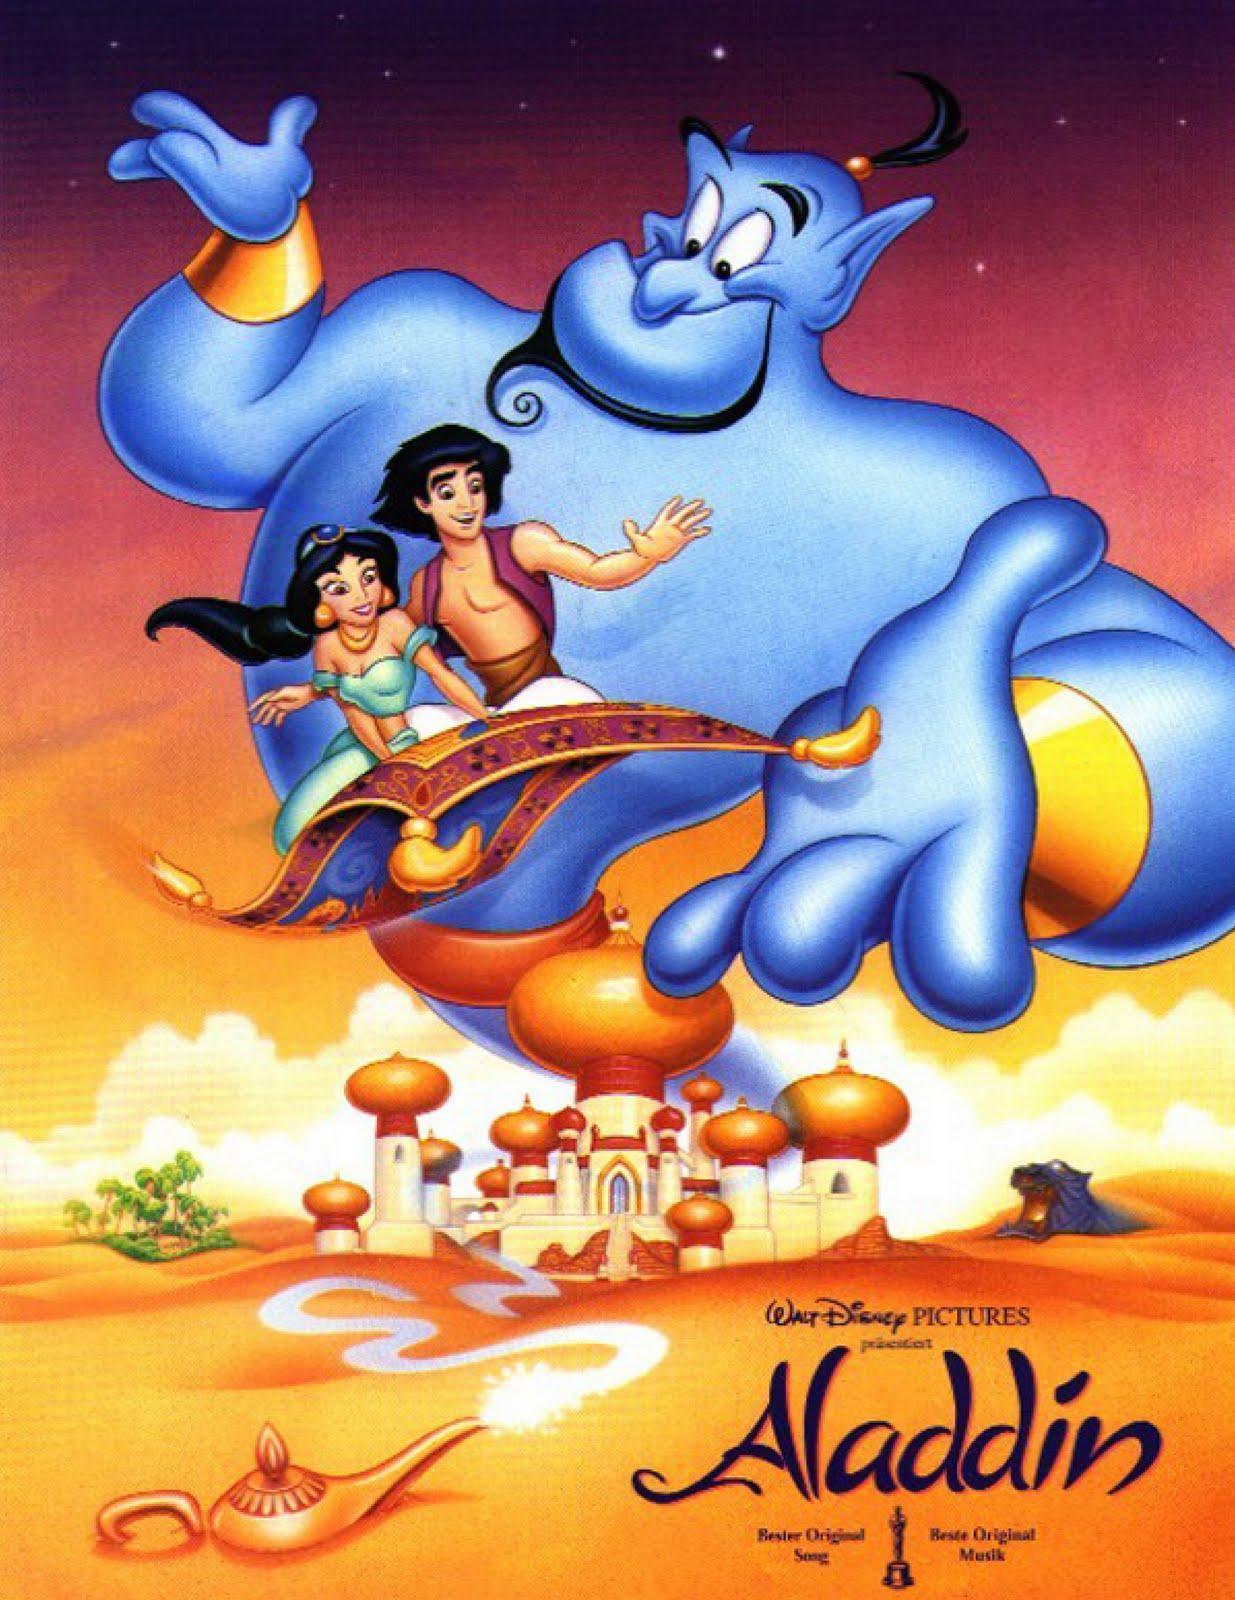 Aladdin High Resolution Wallpapers 1080p   cartoonwallpapershd.com ...